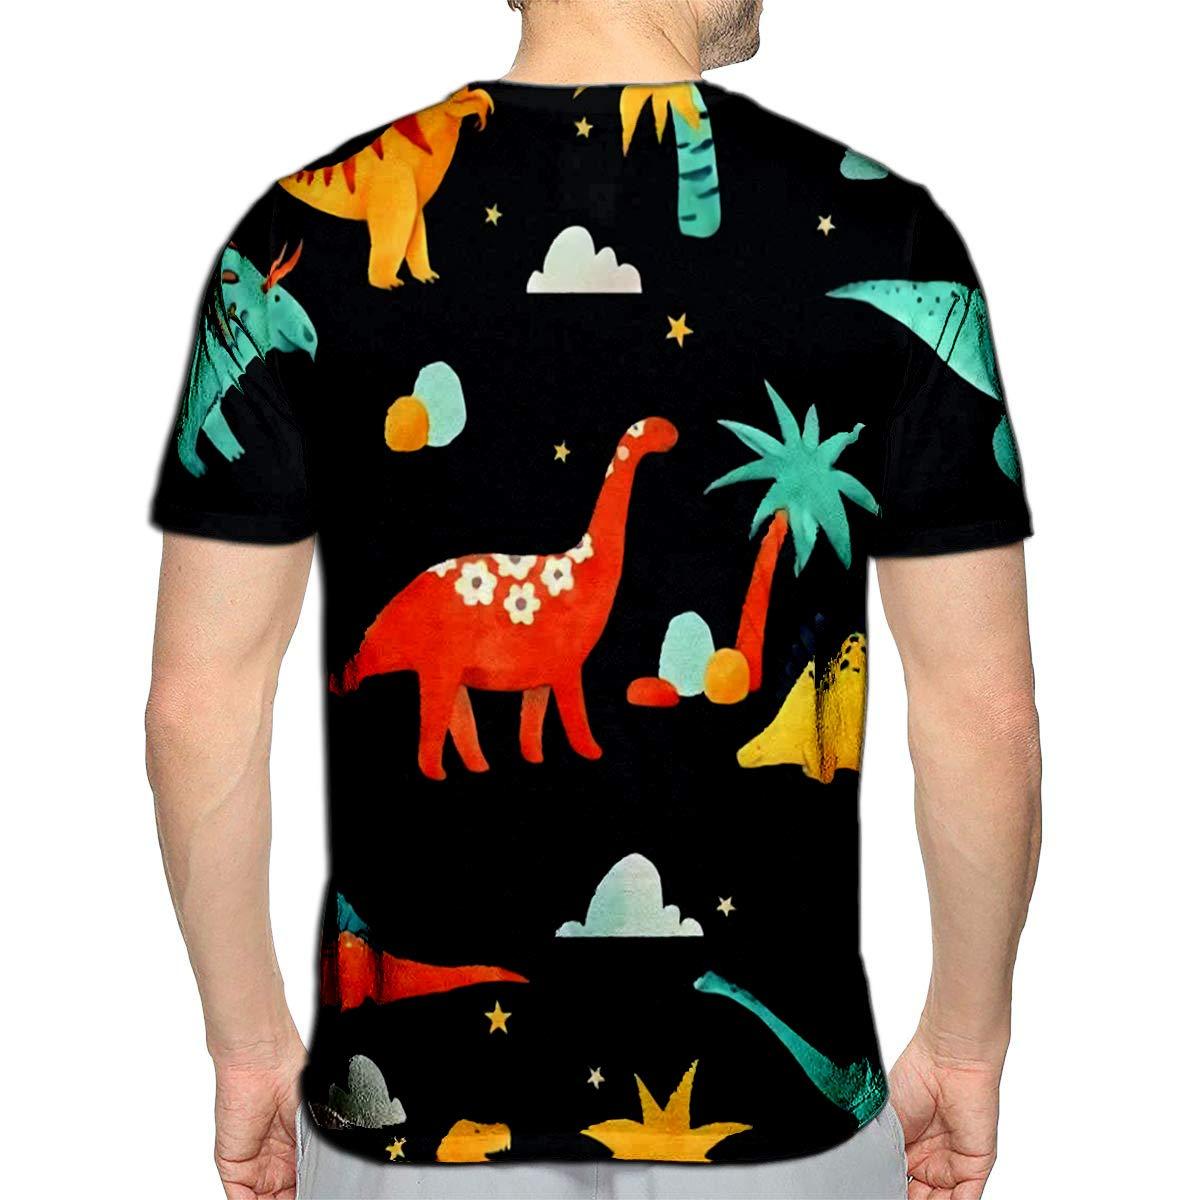 PUTIEN Animal Print Decor Girl Regular-Fit Short-Sleeve Shirt,Personality Pattern,Tint